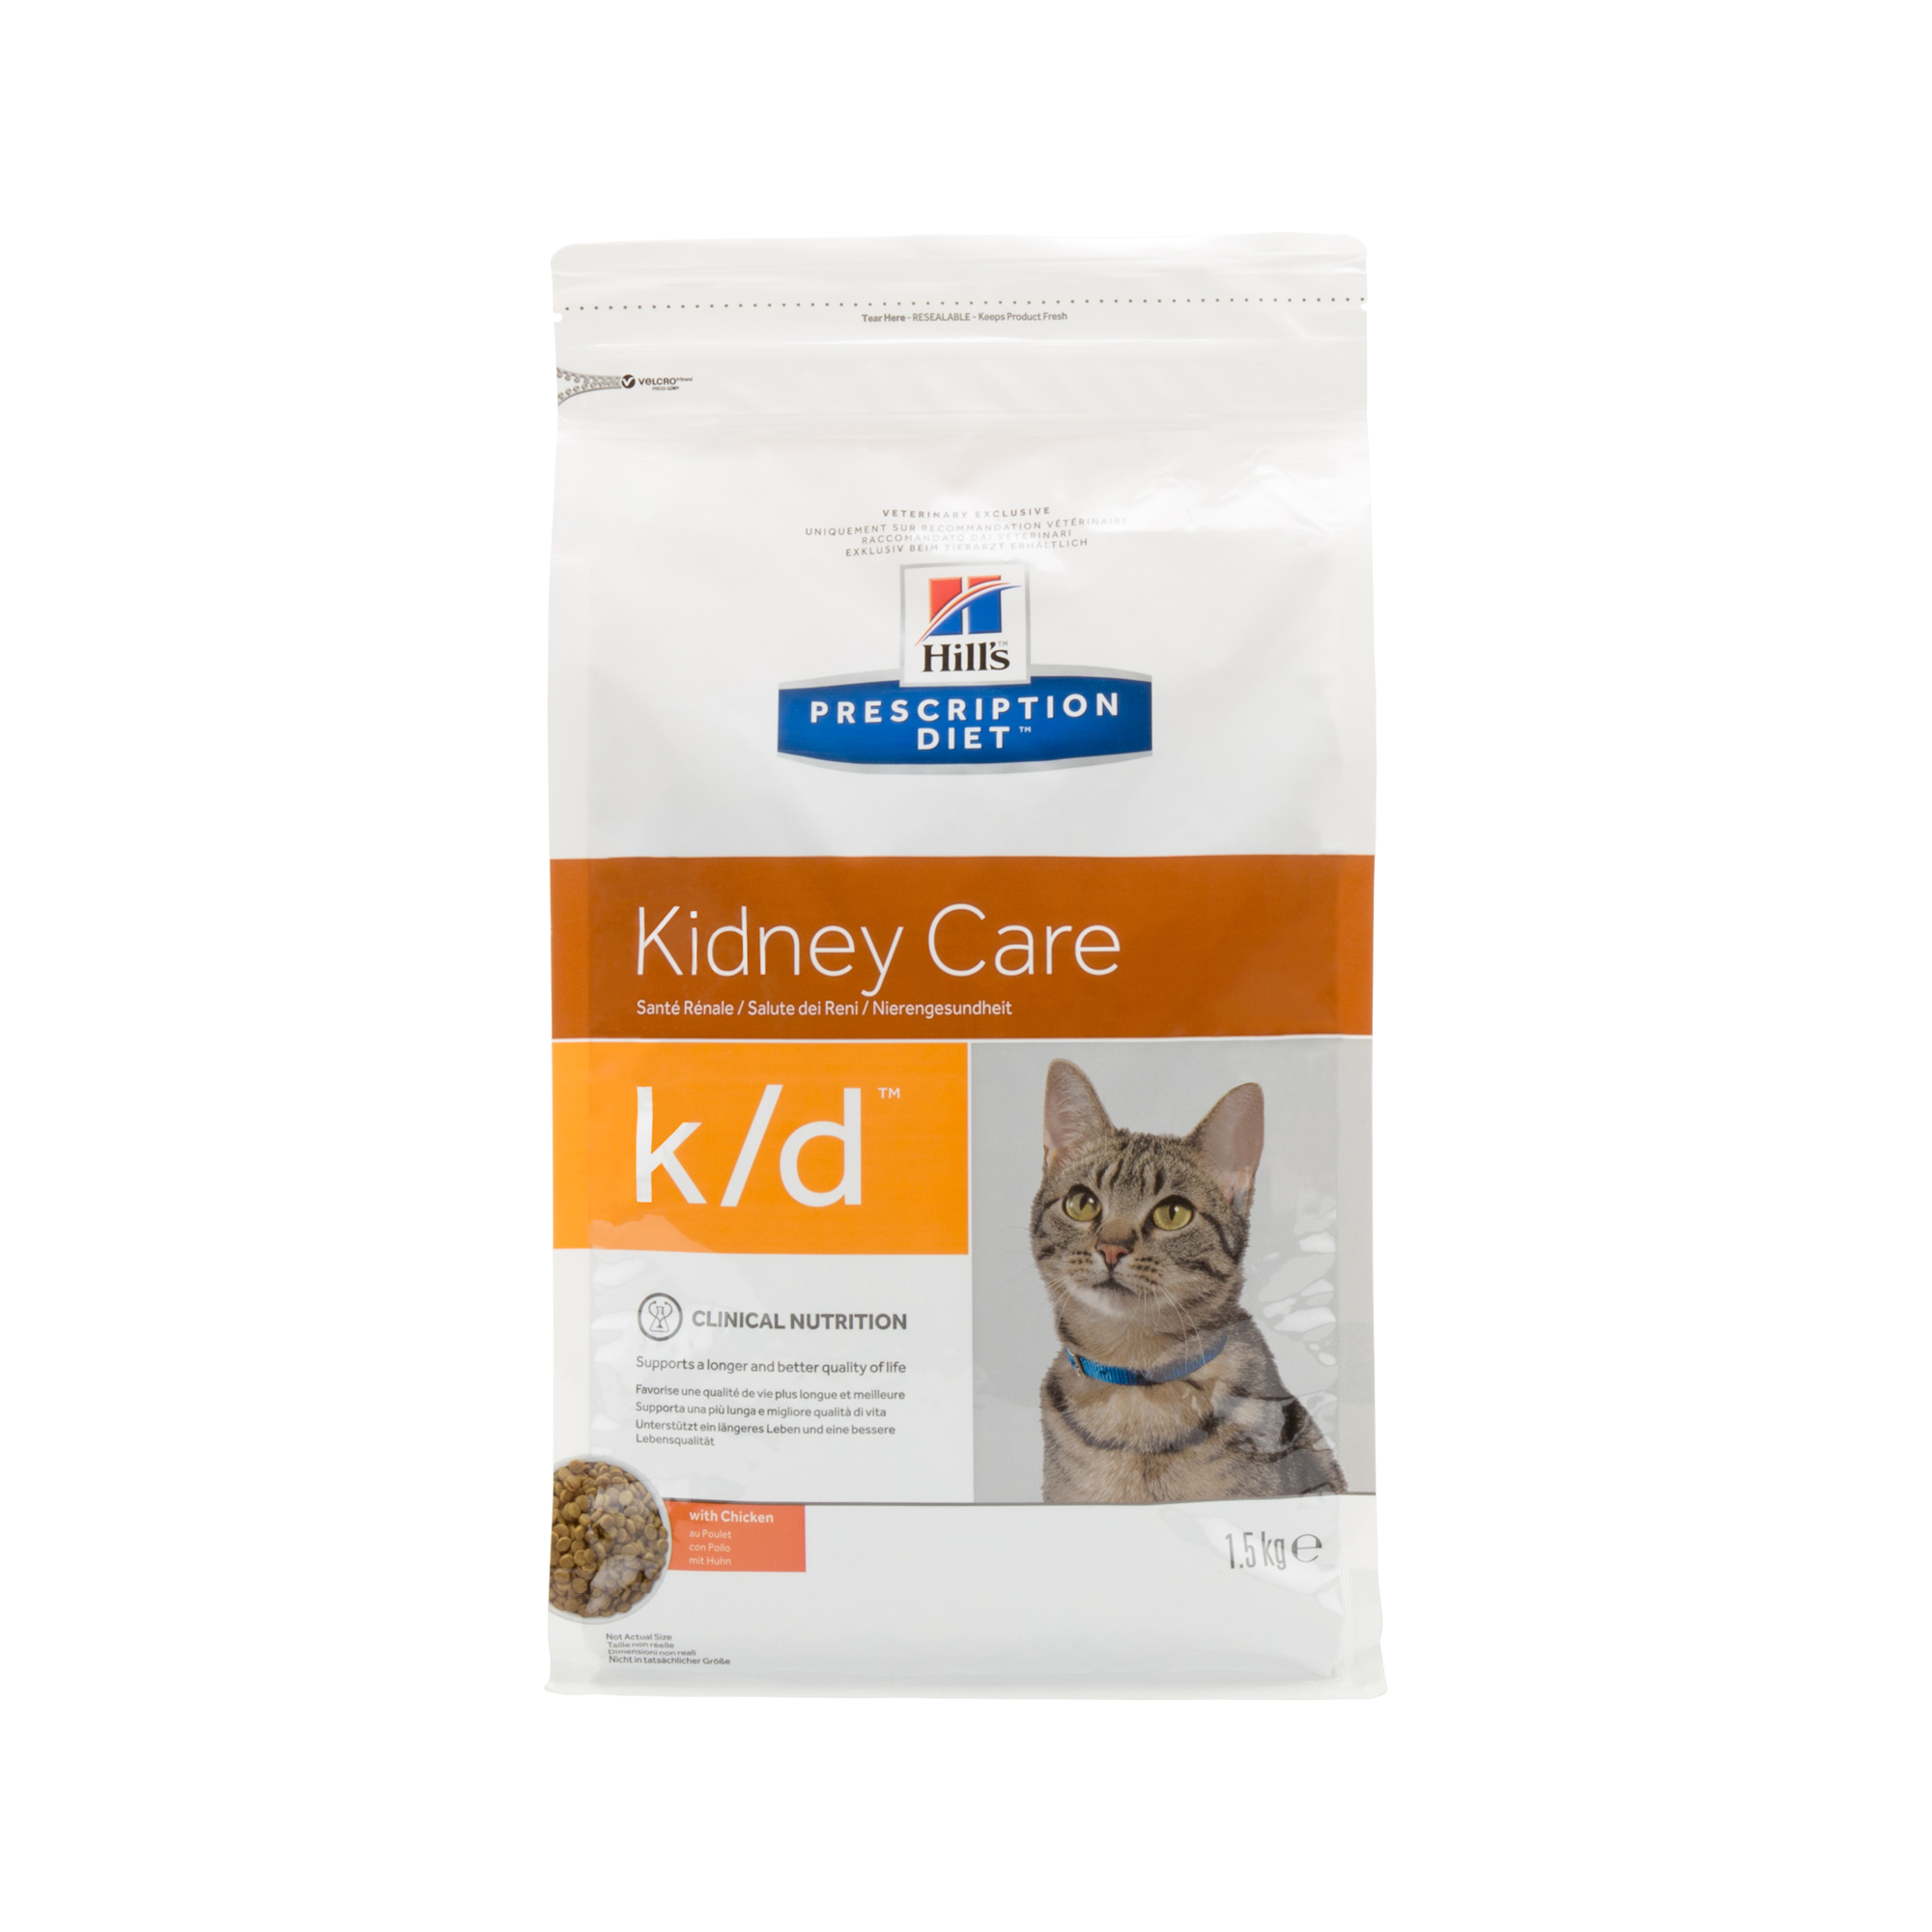 Hill's Prescription Diet k/d Kidney Care Katzenfutter - Huhn